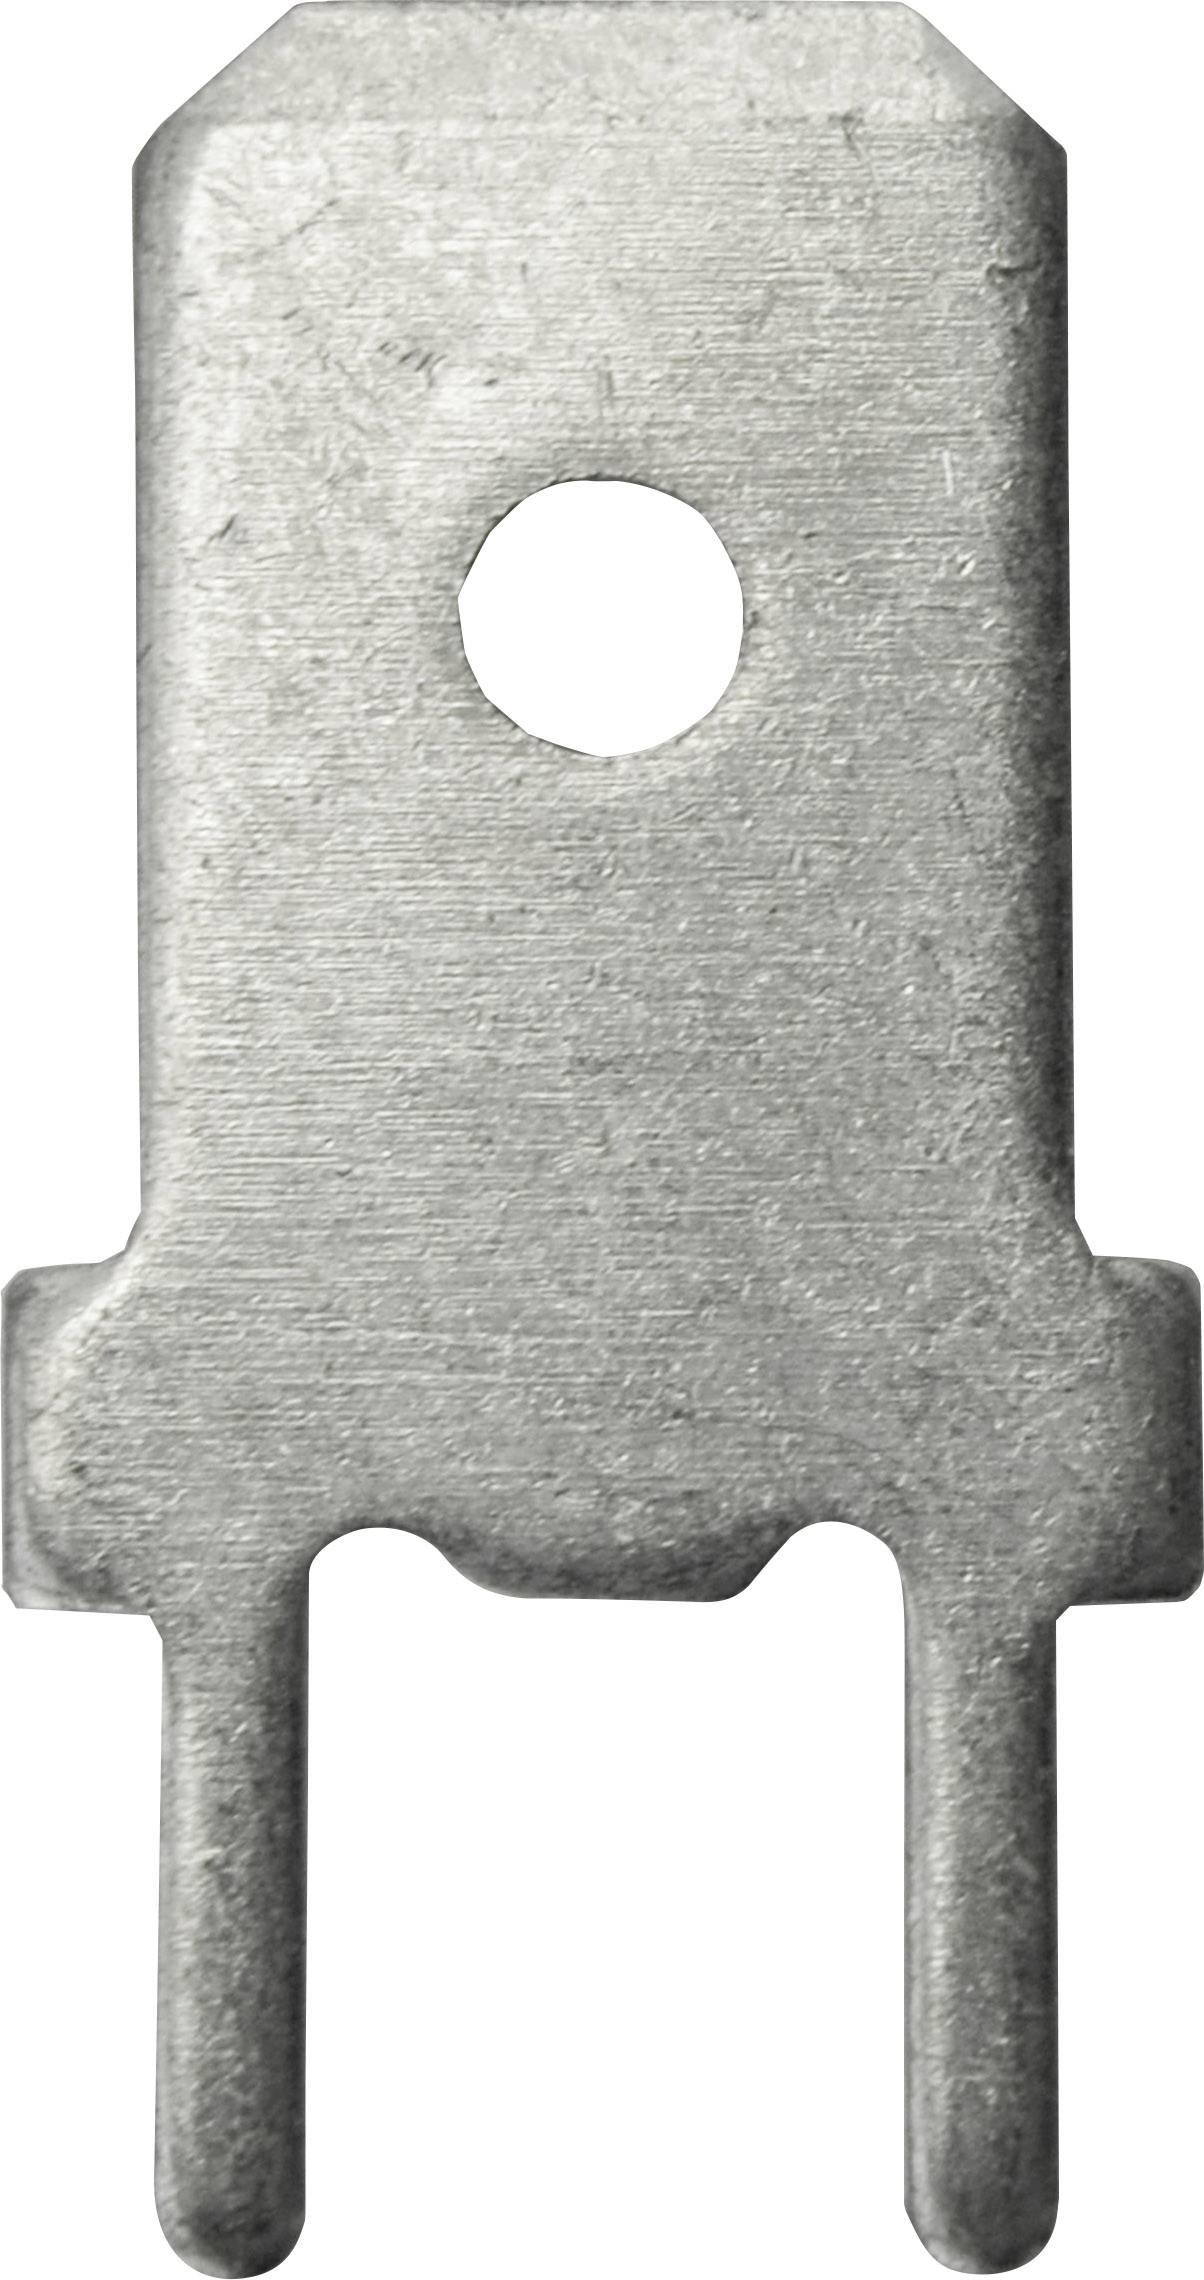 Faston zástrčka Vogt Verbindungstechnik 3866g.68 6.3 mm x 180 °, bez izolace, kov, 100 ks